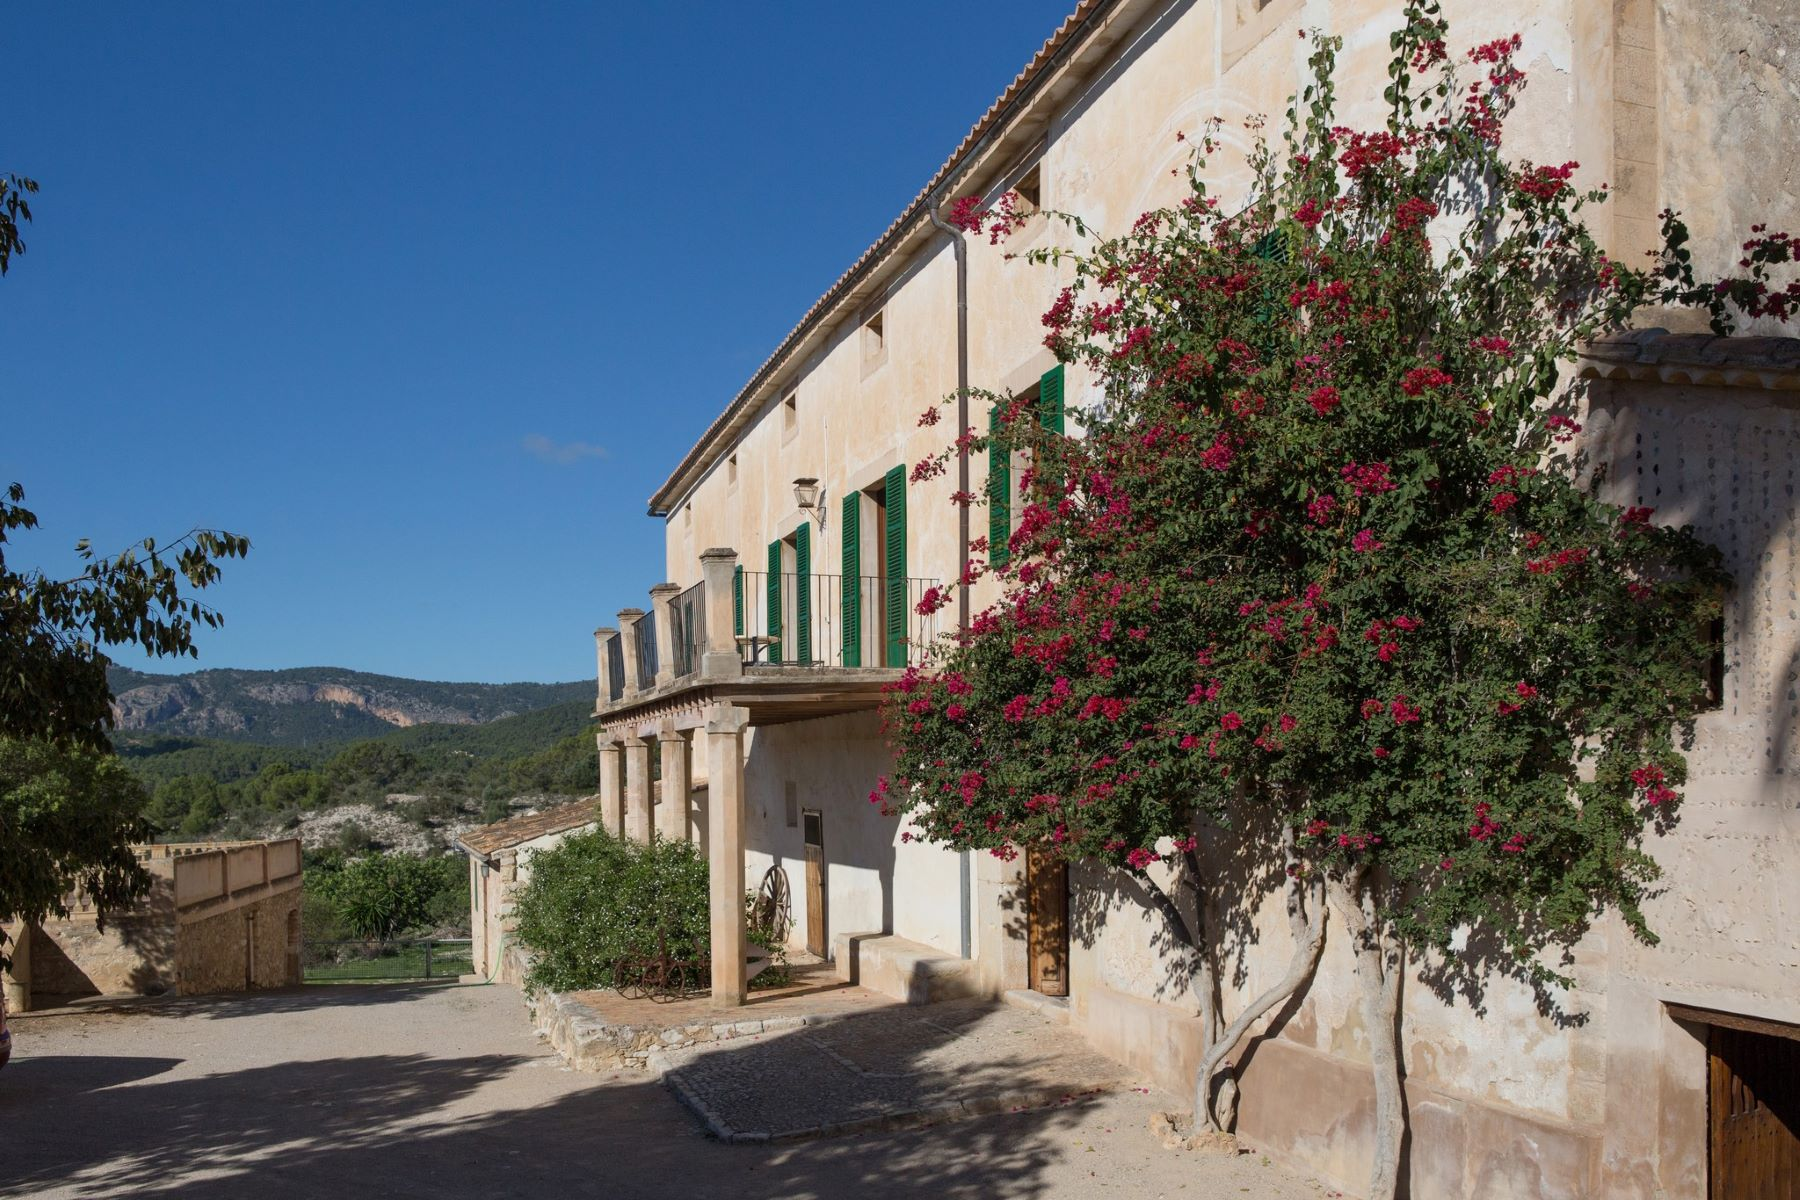 Single Family Homes for Sale at Majorcan finca in Calvia Calvia, Balearic Islands Spain